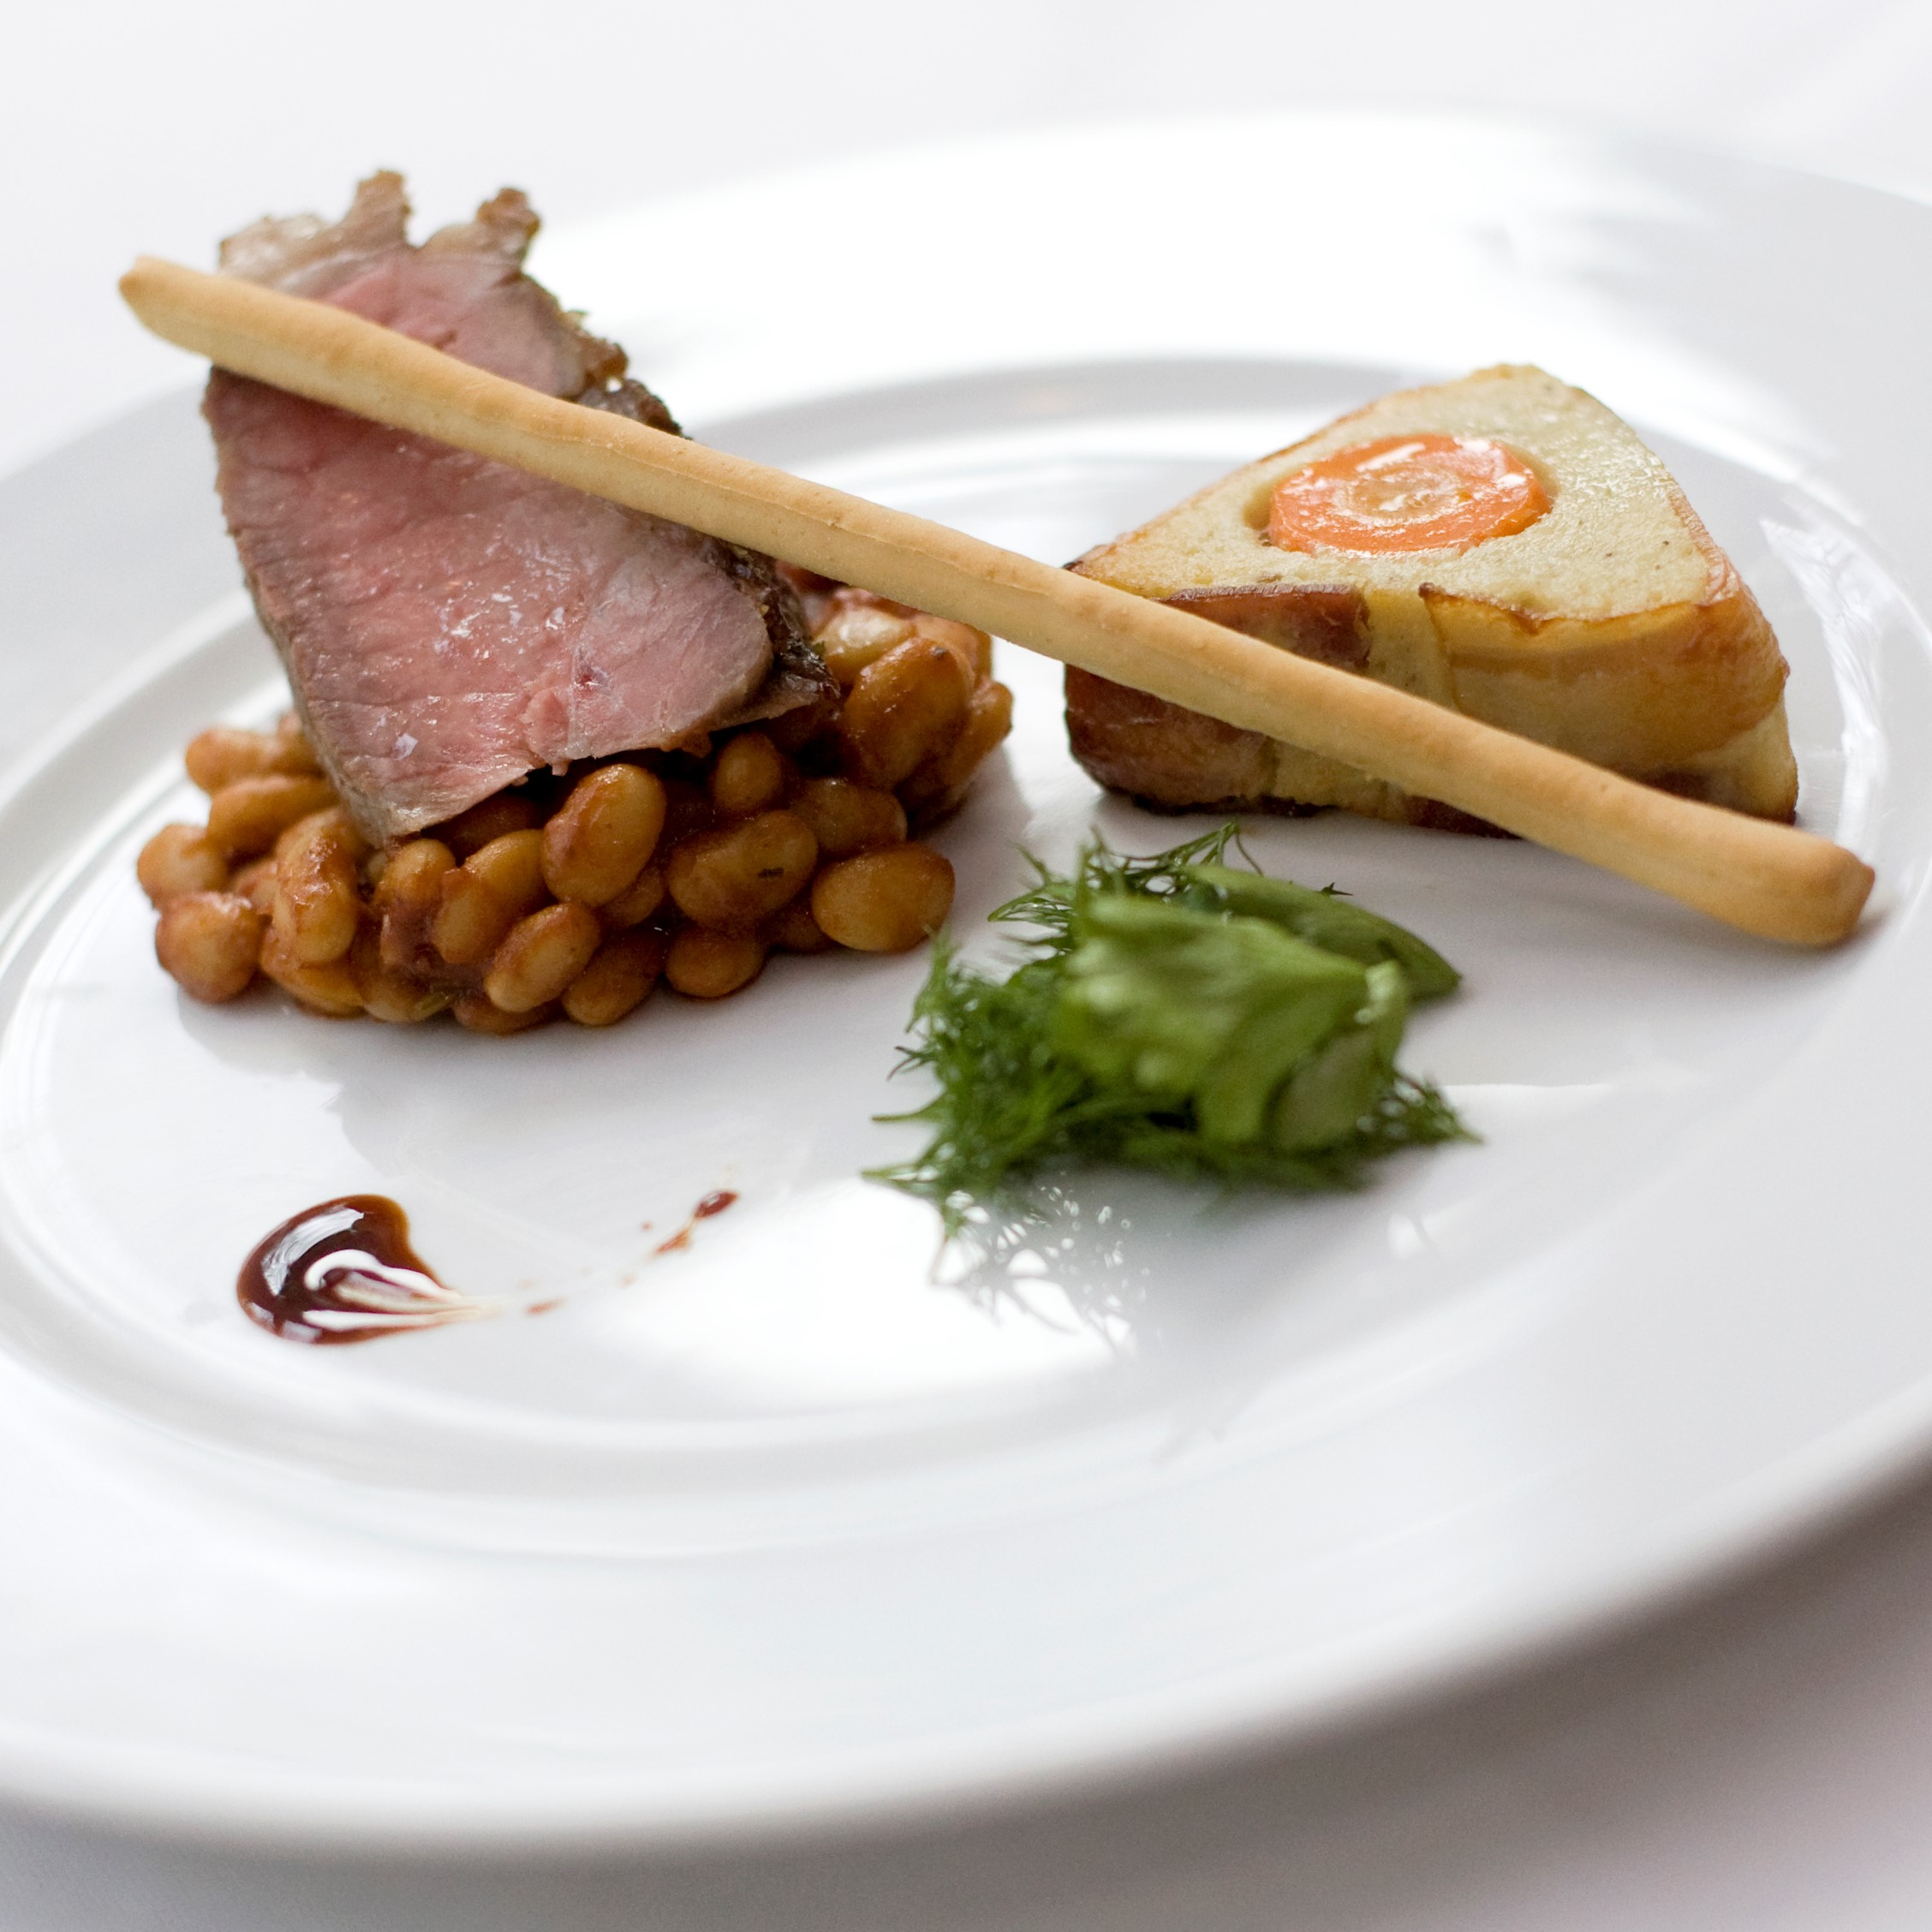 Restaurant Møllehuset Frederikhavn Årstidens menu sæsonmenu hovedret